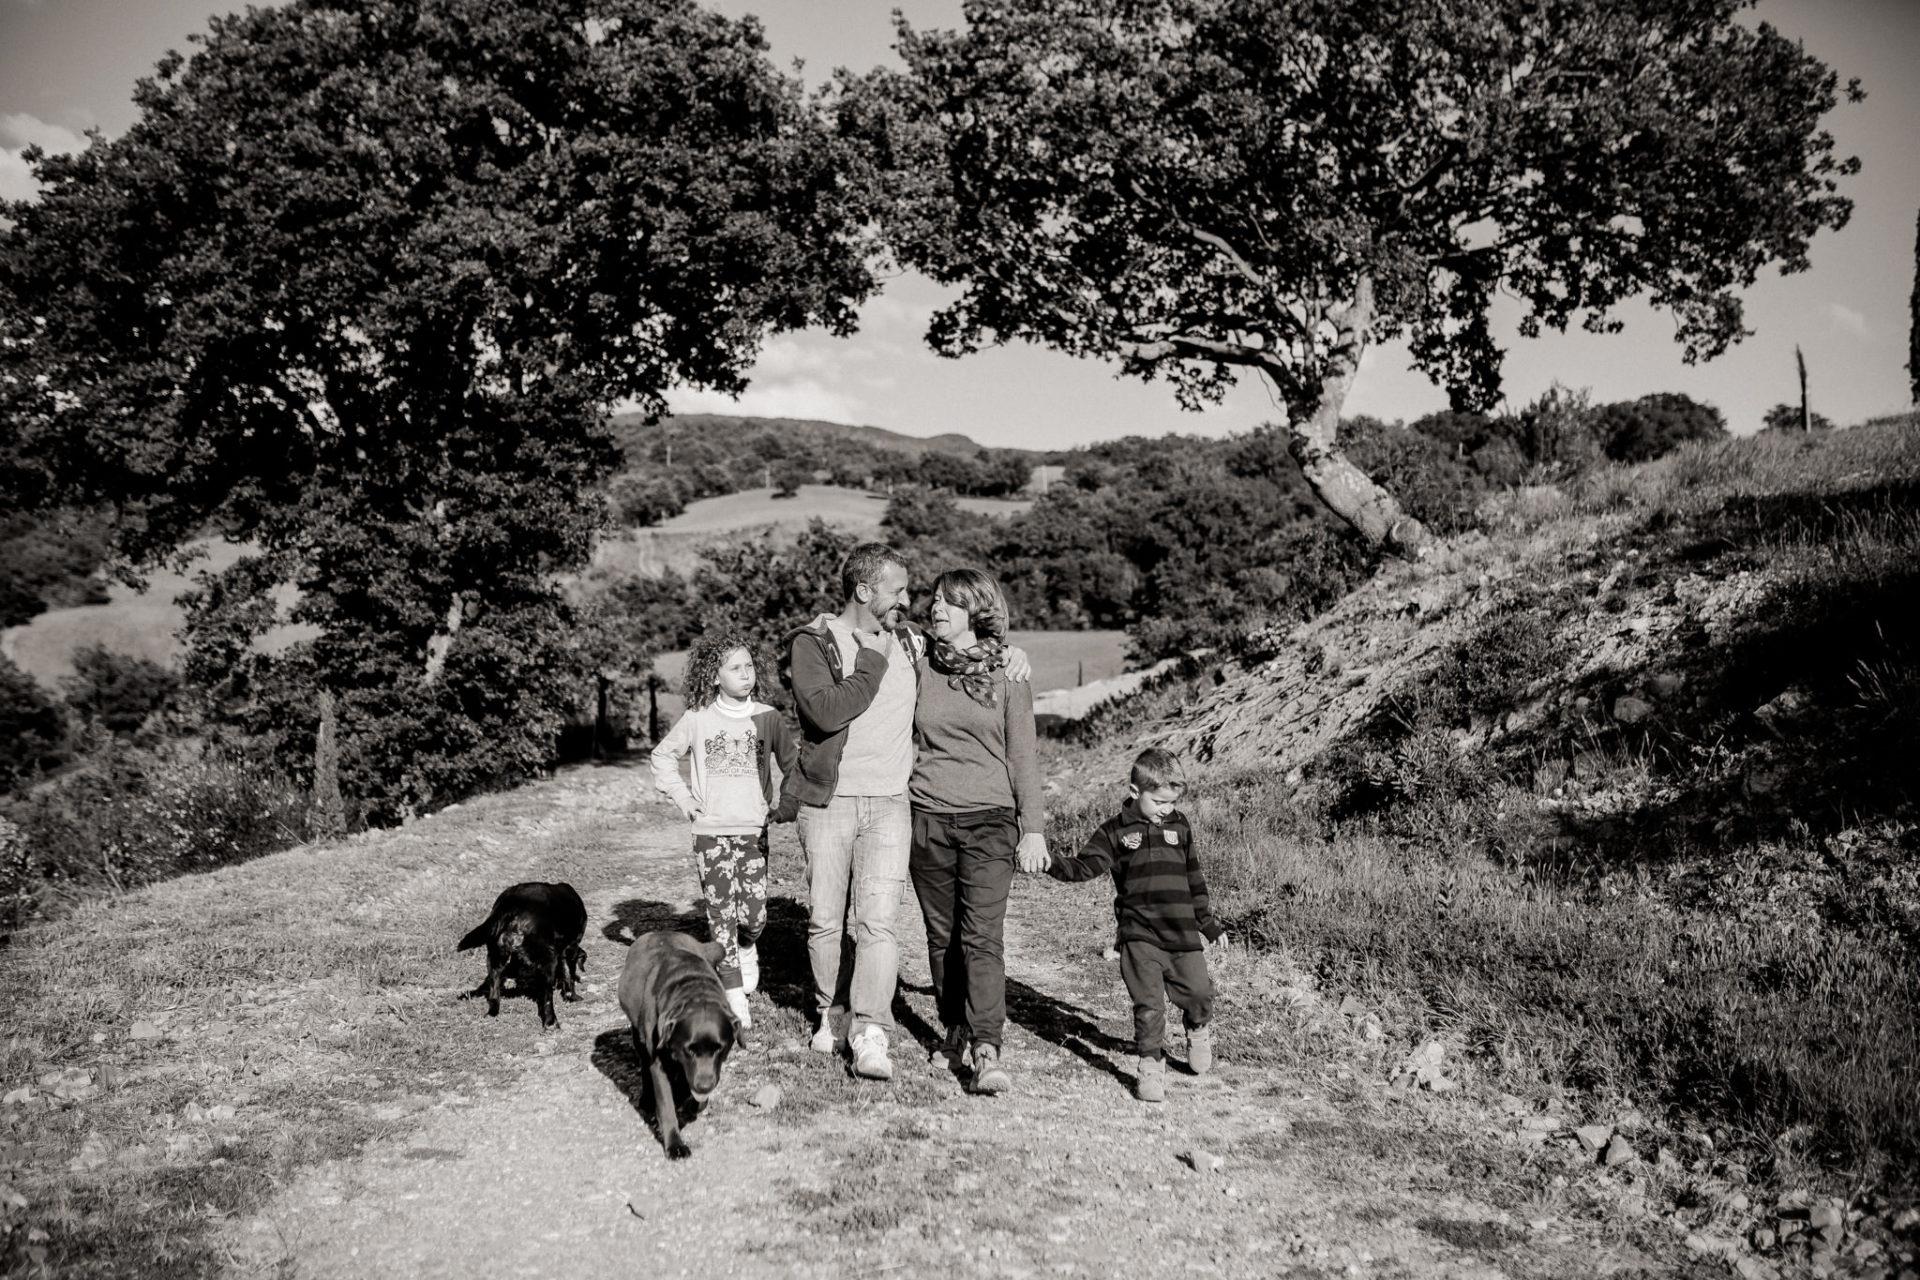 family photos holiday tuscany-dimora santa margherita-intimate portrait-family photographer stuttgart-labrador play time